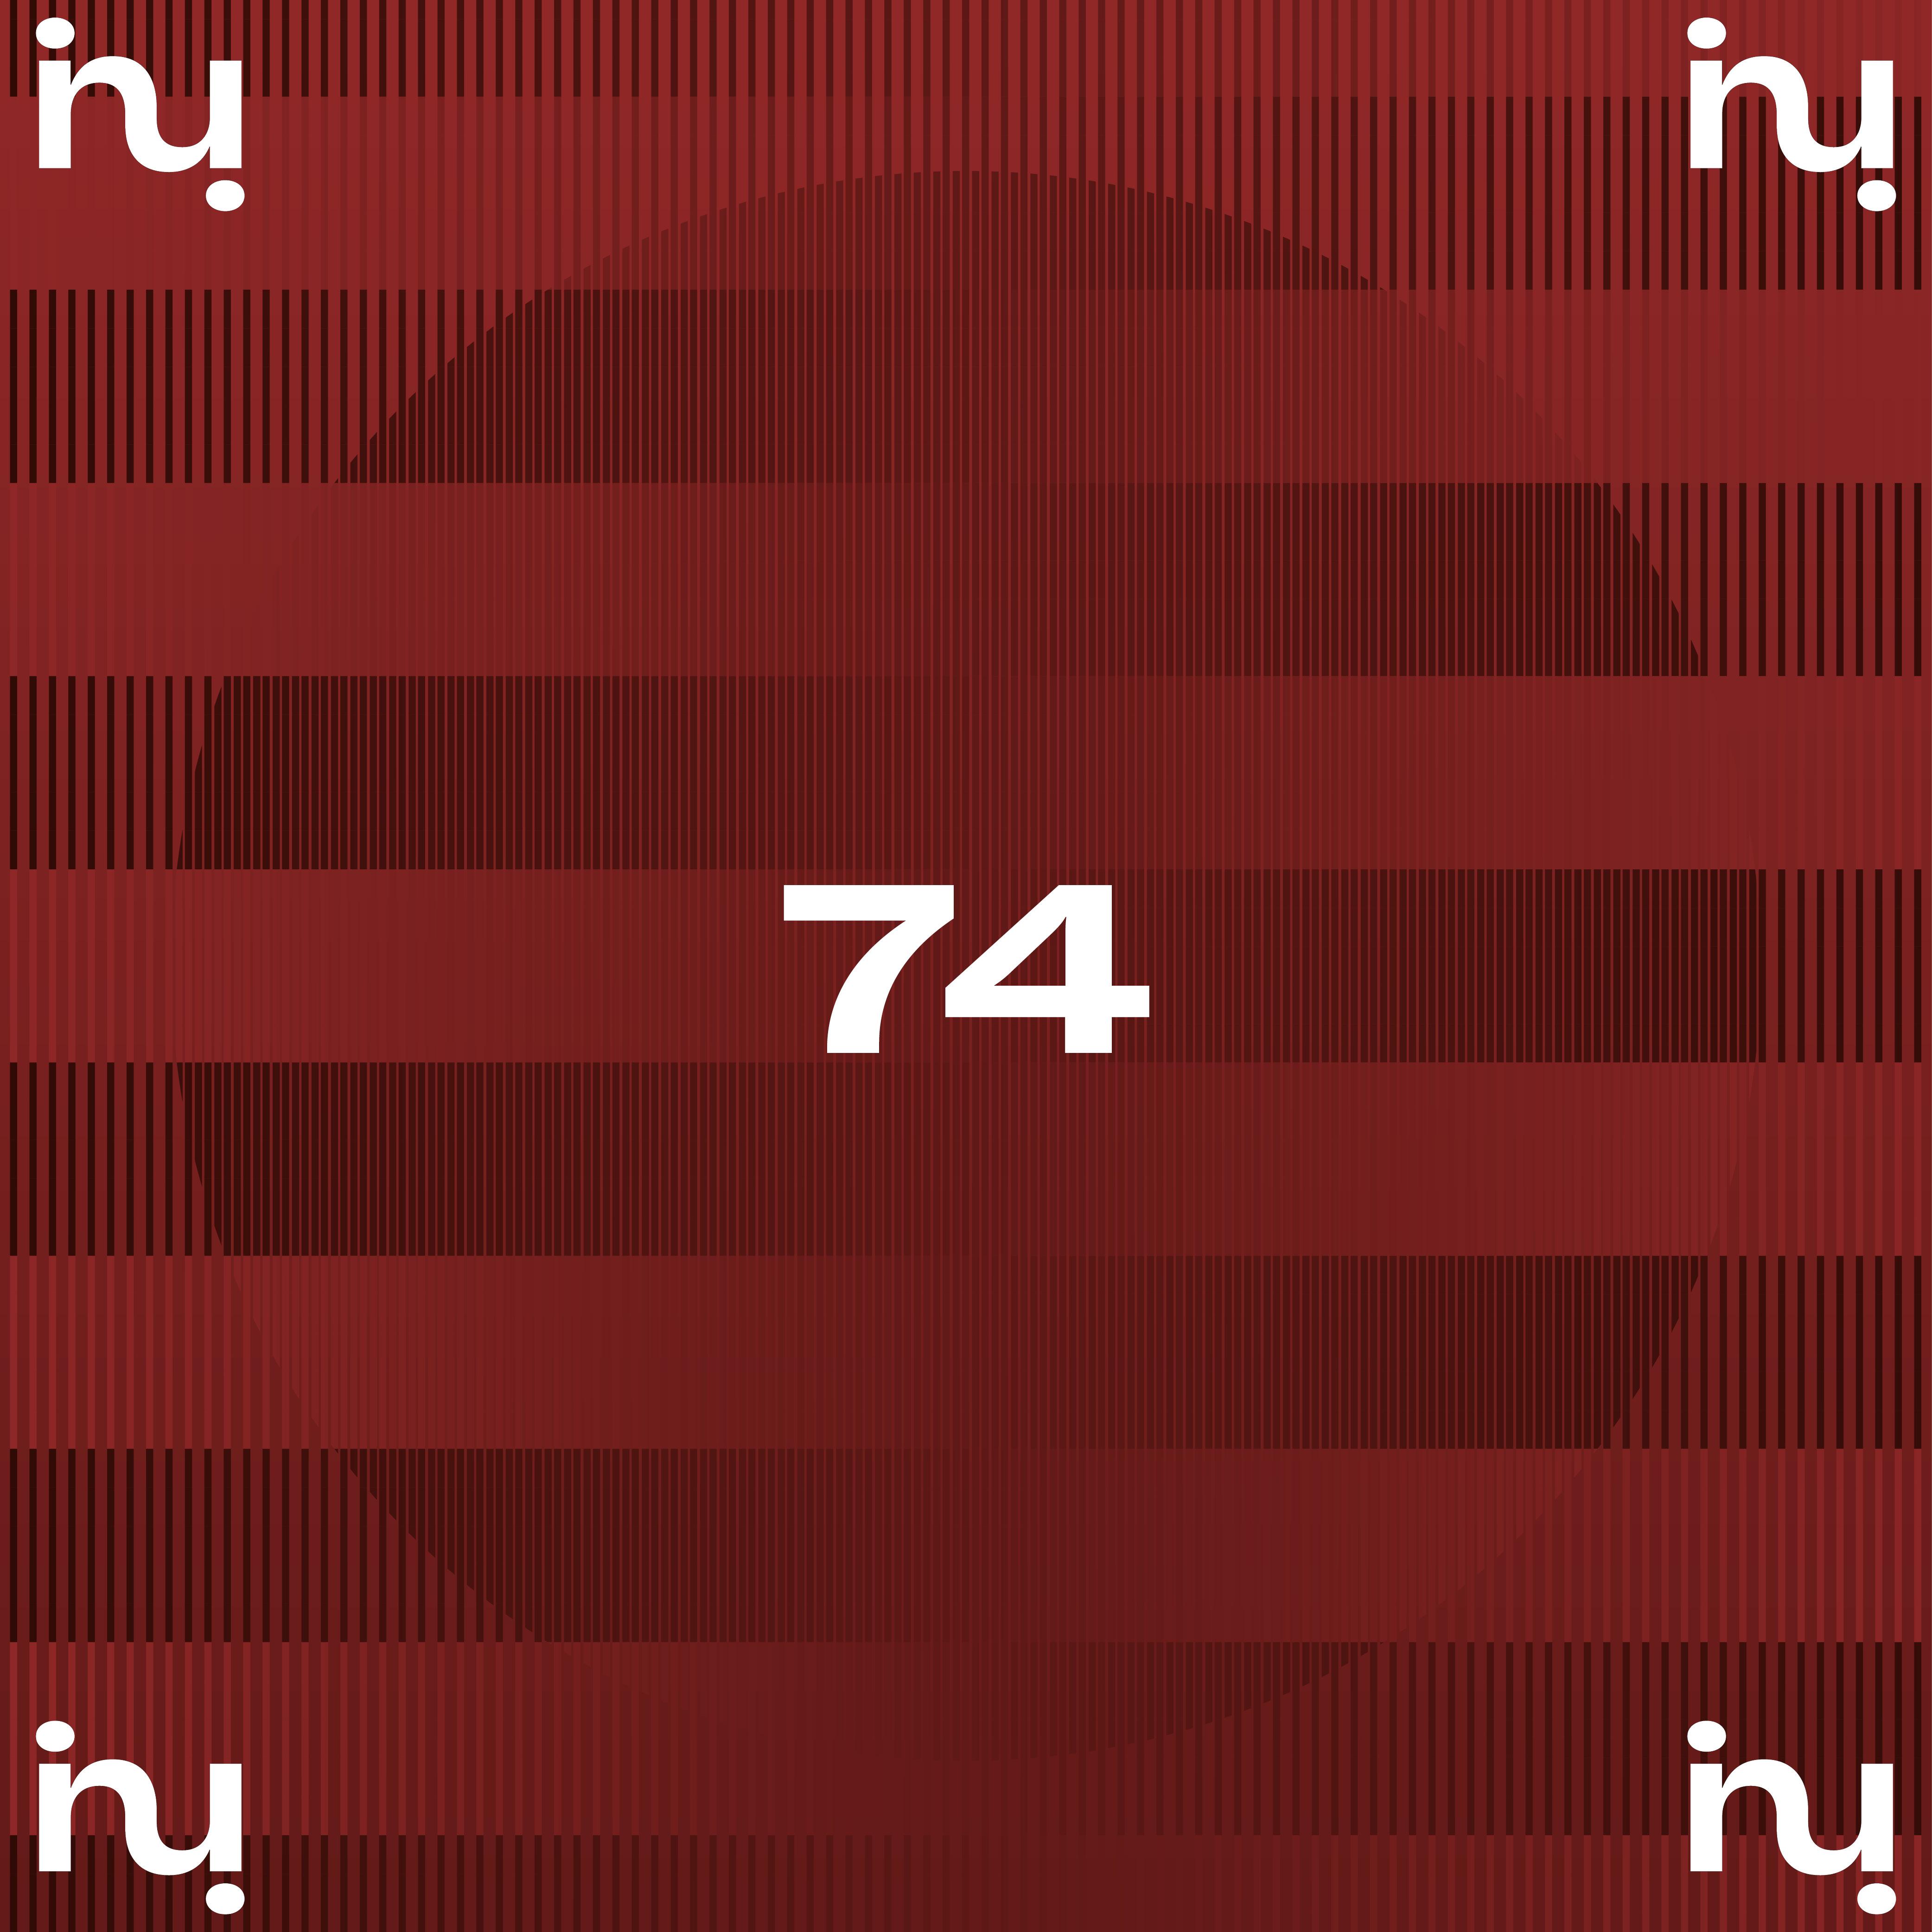 LISTENUP_PLAYLIST #74